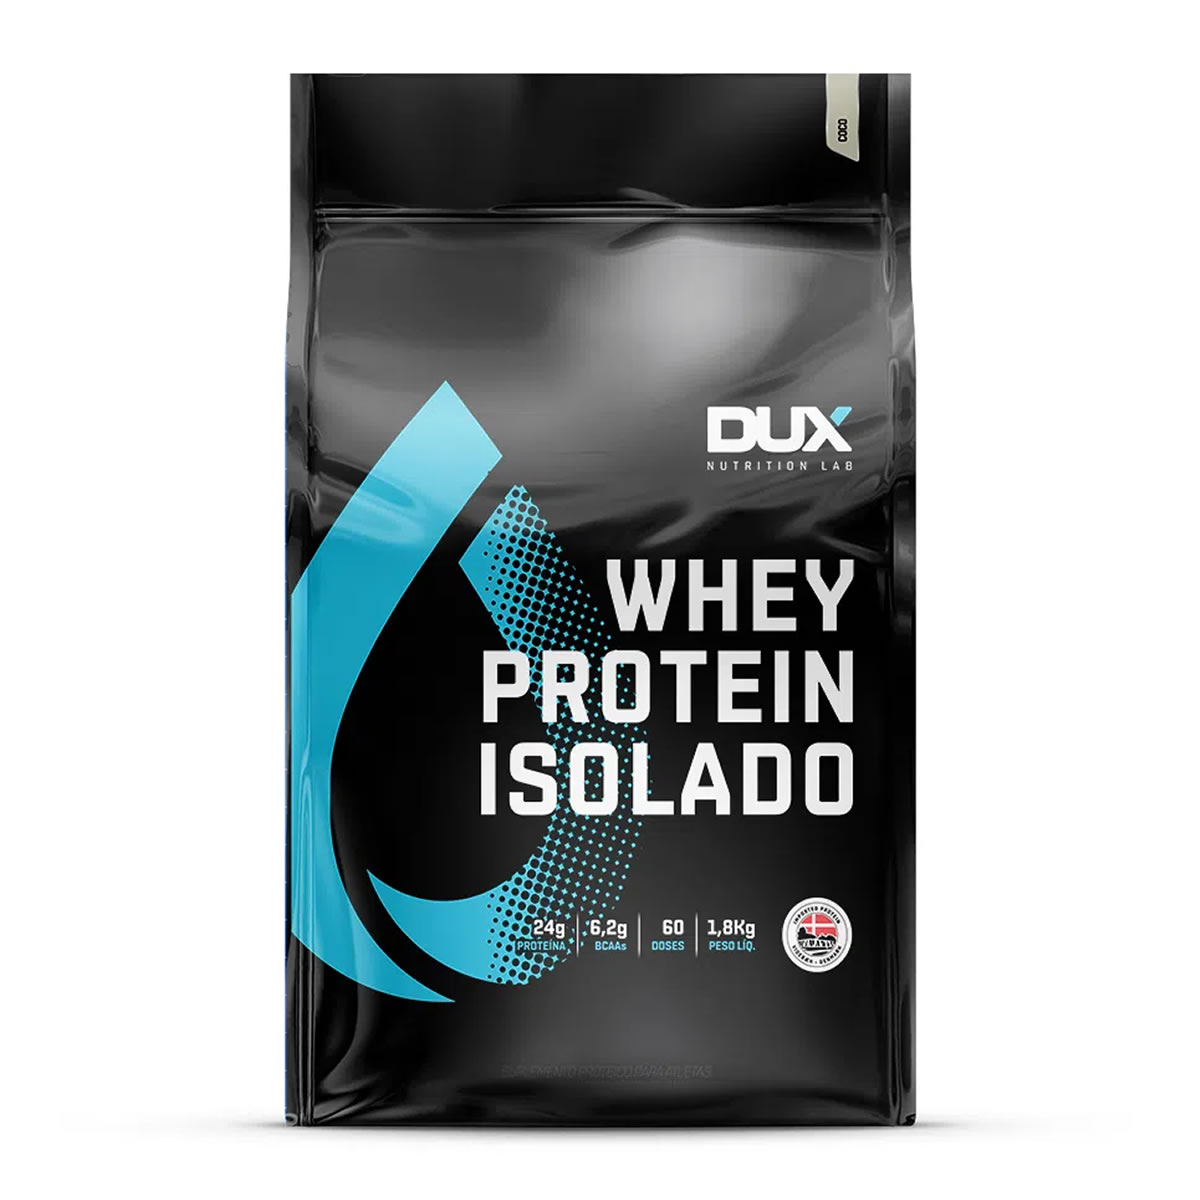 Whey Protein Isolado - 1,8kg - Dux Nutrition